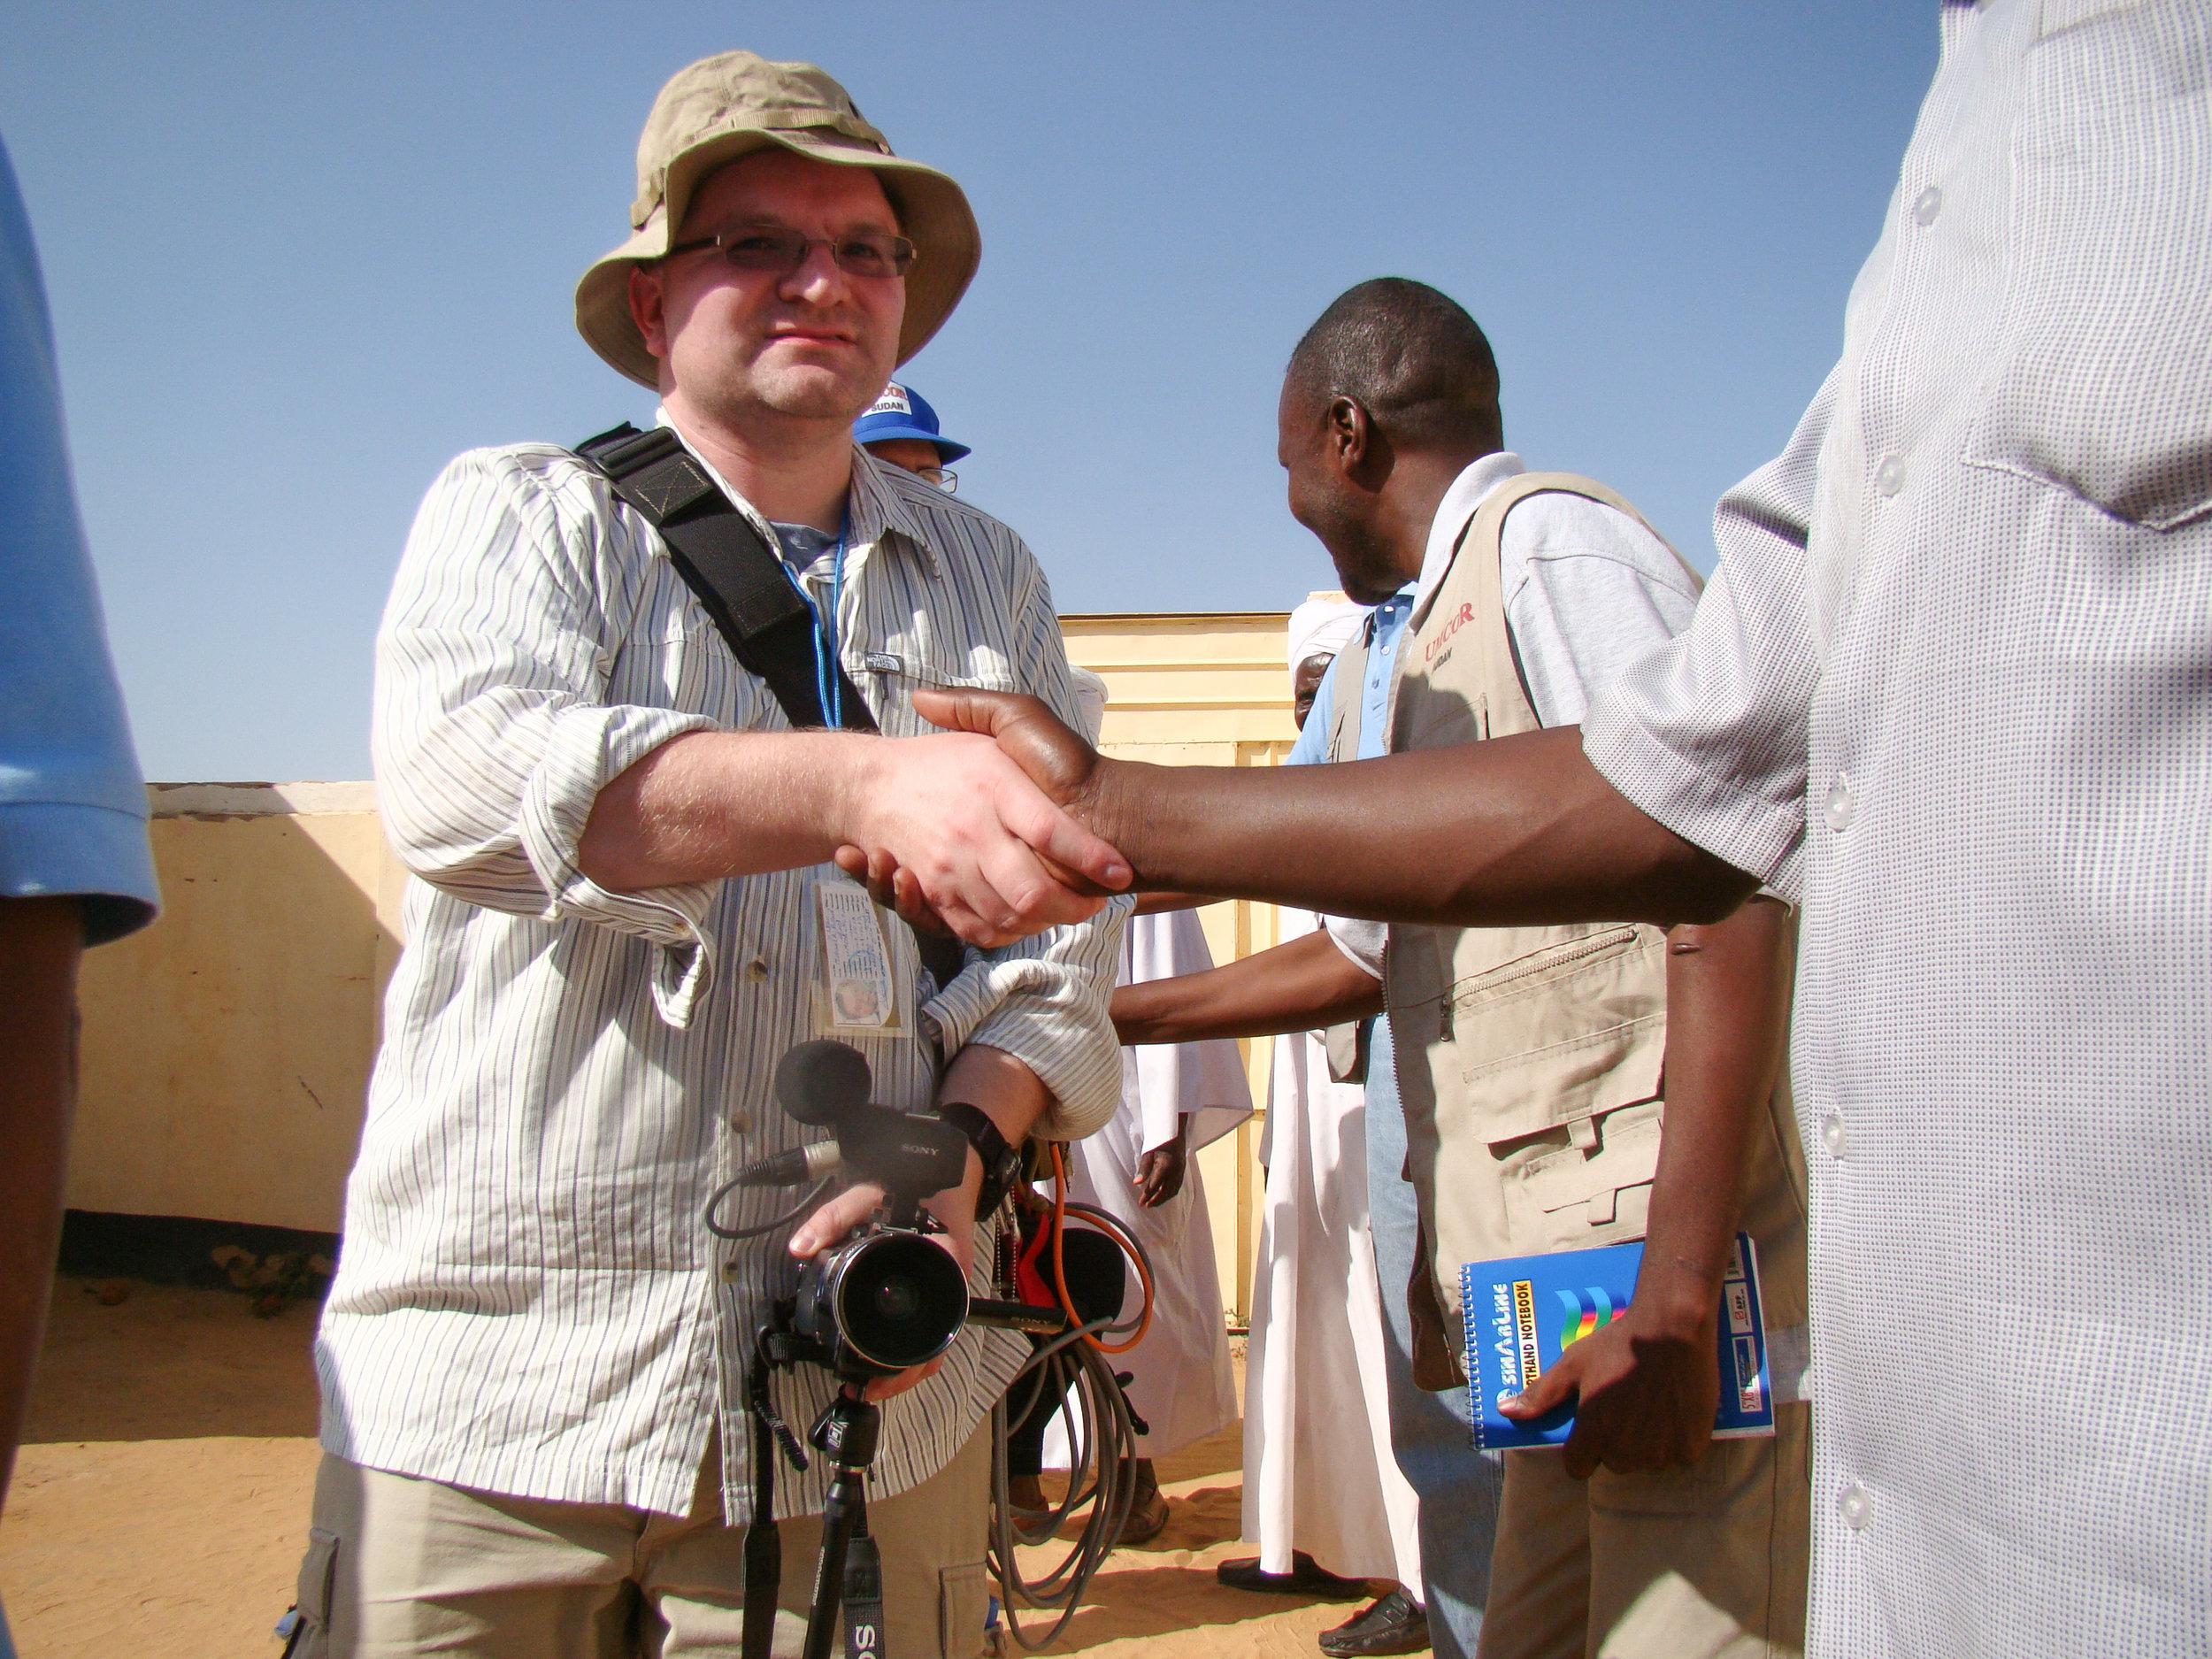 Sudan09_4095_E-W.jpg